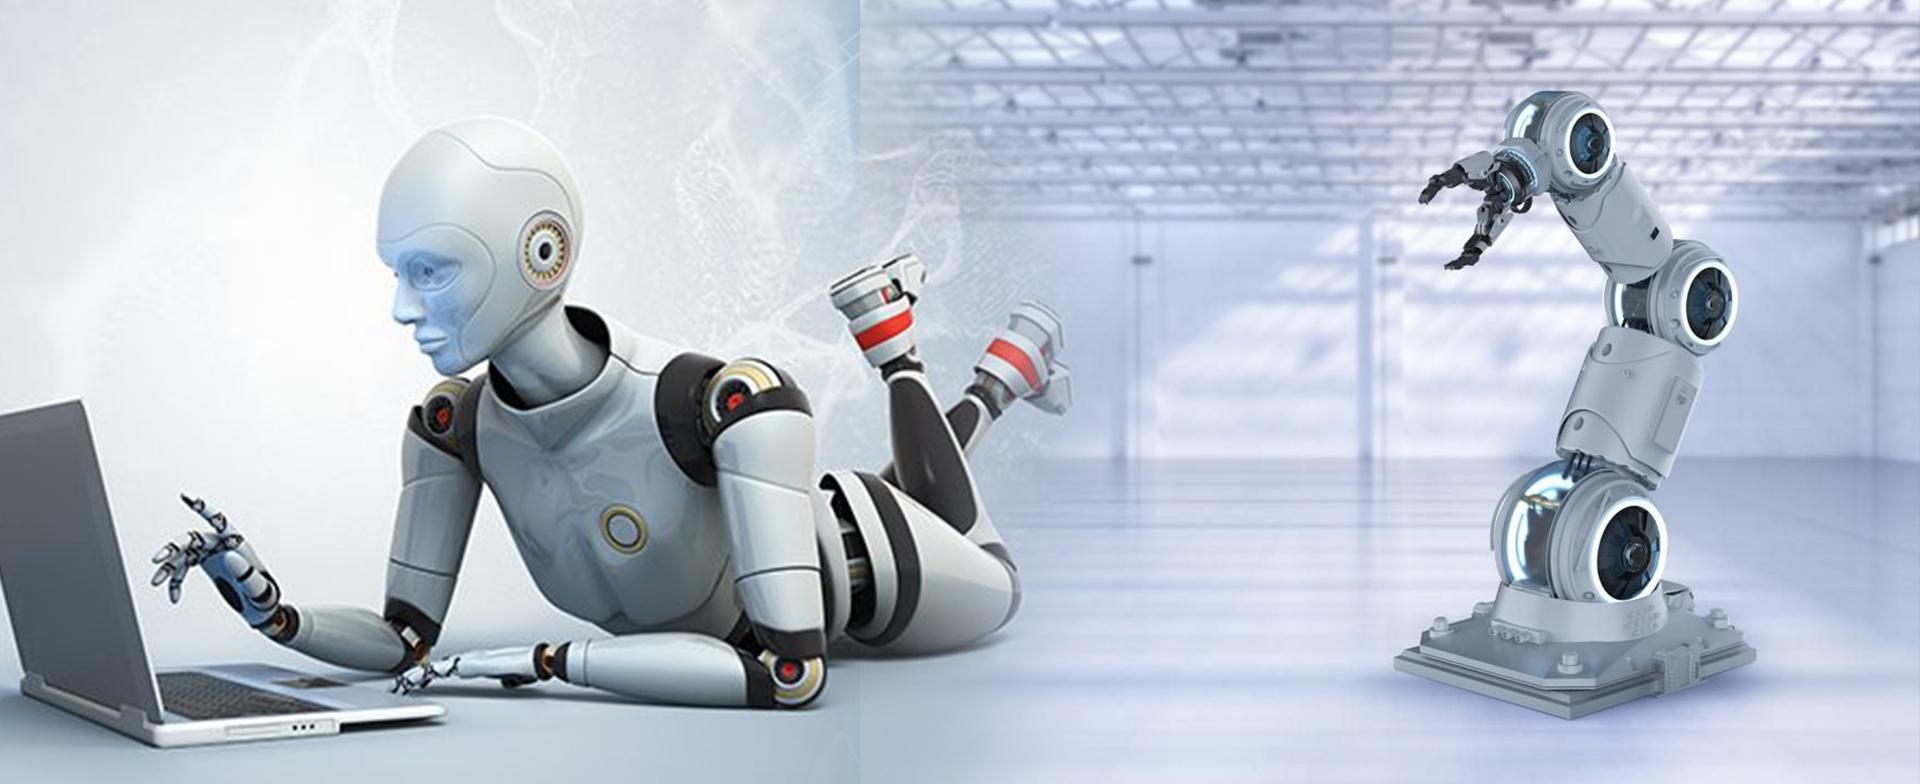 Artificial Intelligence with RPA, Robotics process automation service Dubai, Robotics process automation service Sharjah, Robotics process automation service Abudhabi, Robotics process automation service UAE